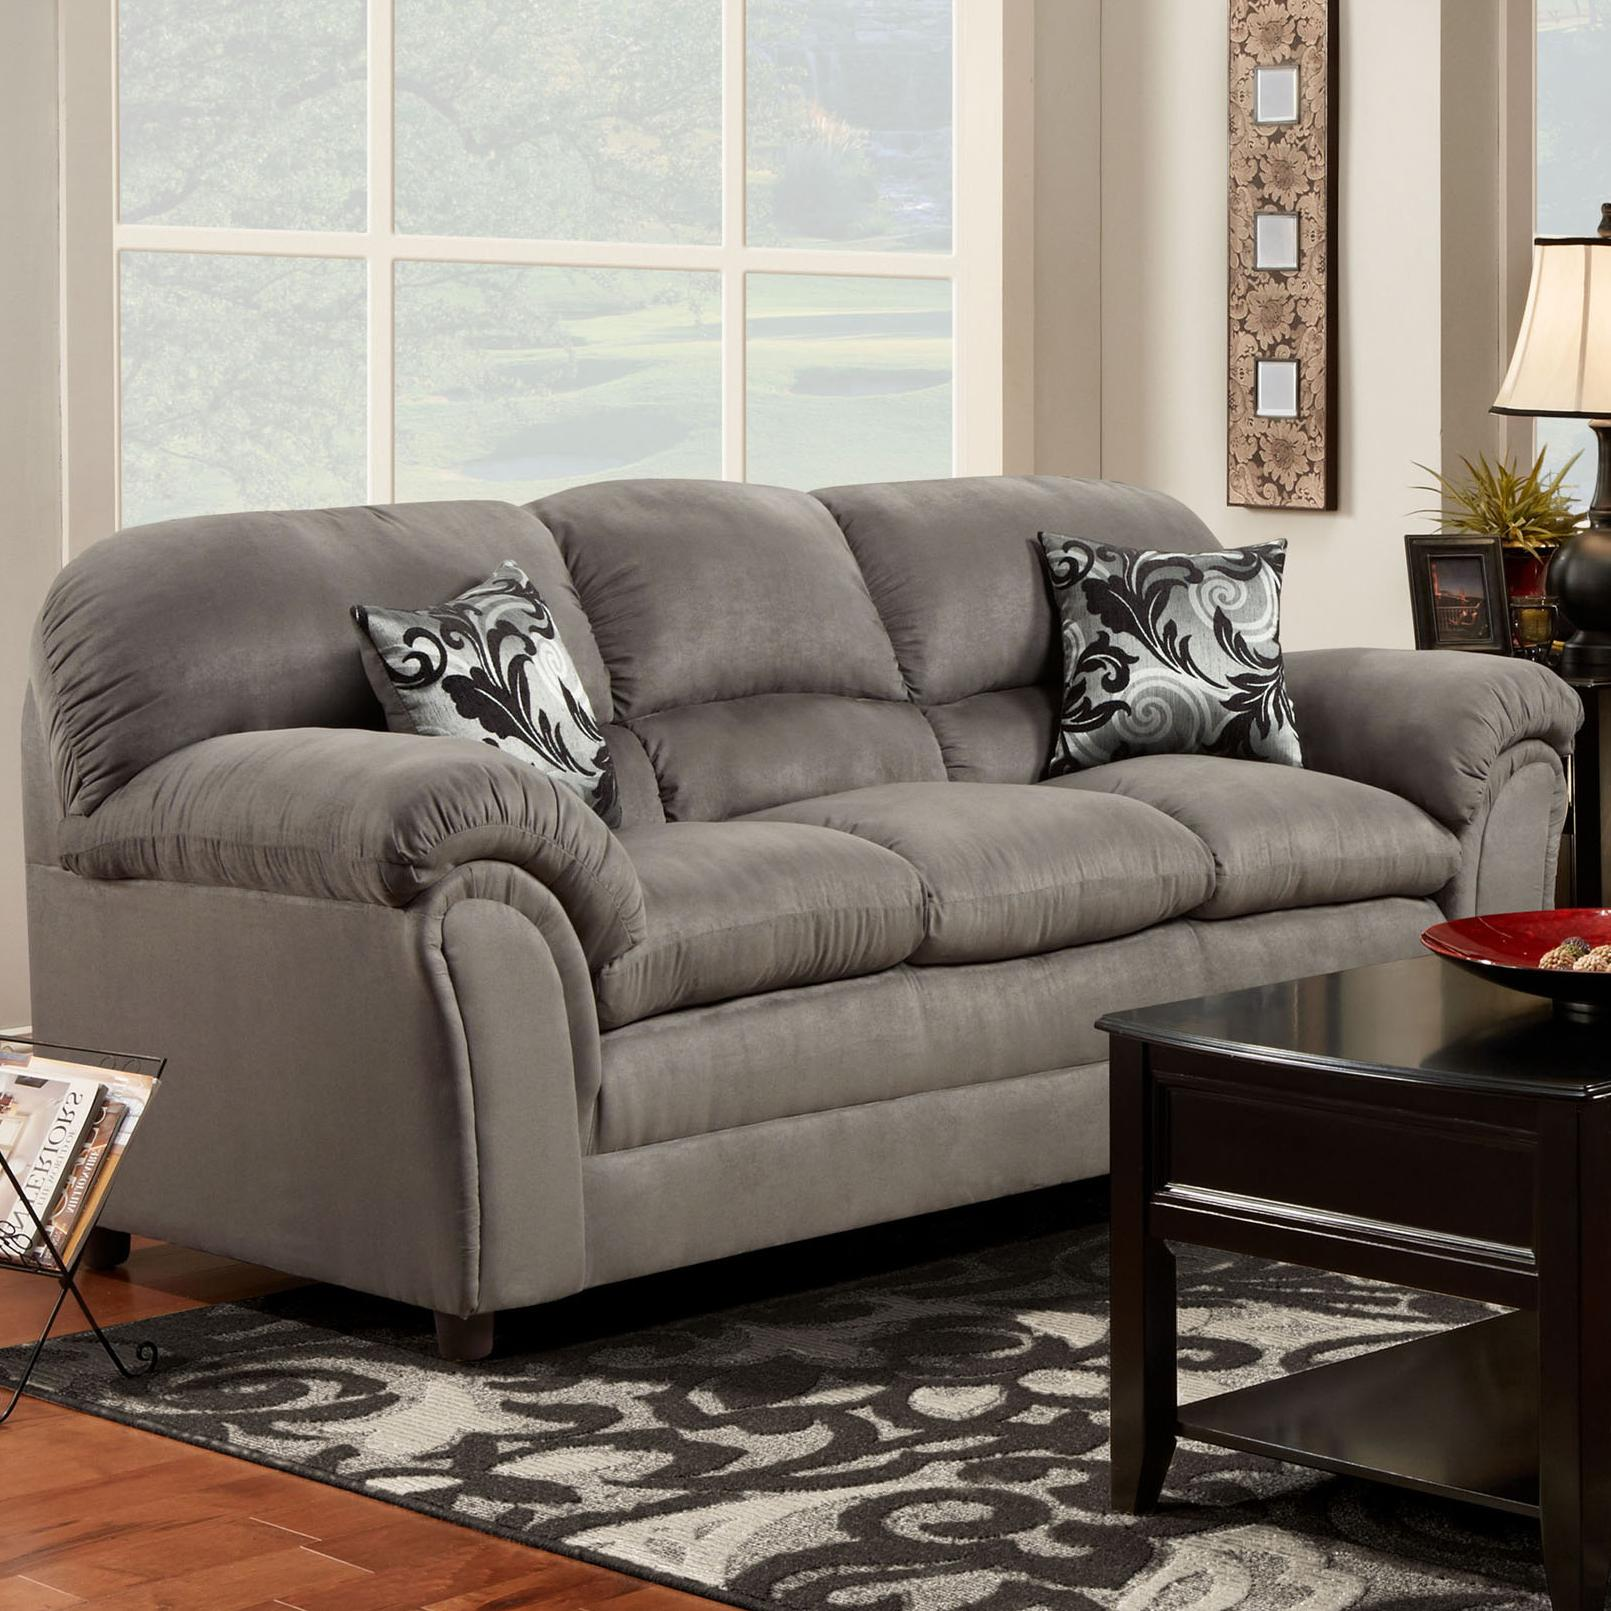 1250 Sofa by Washington Furniture at Lynn's Furniture & Mattress